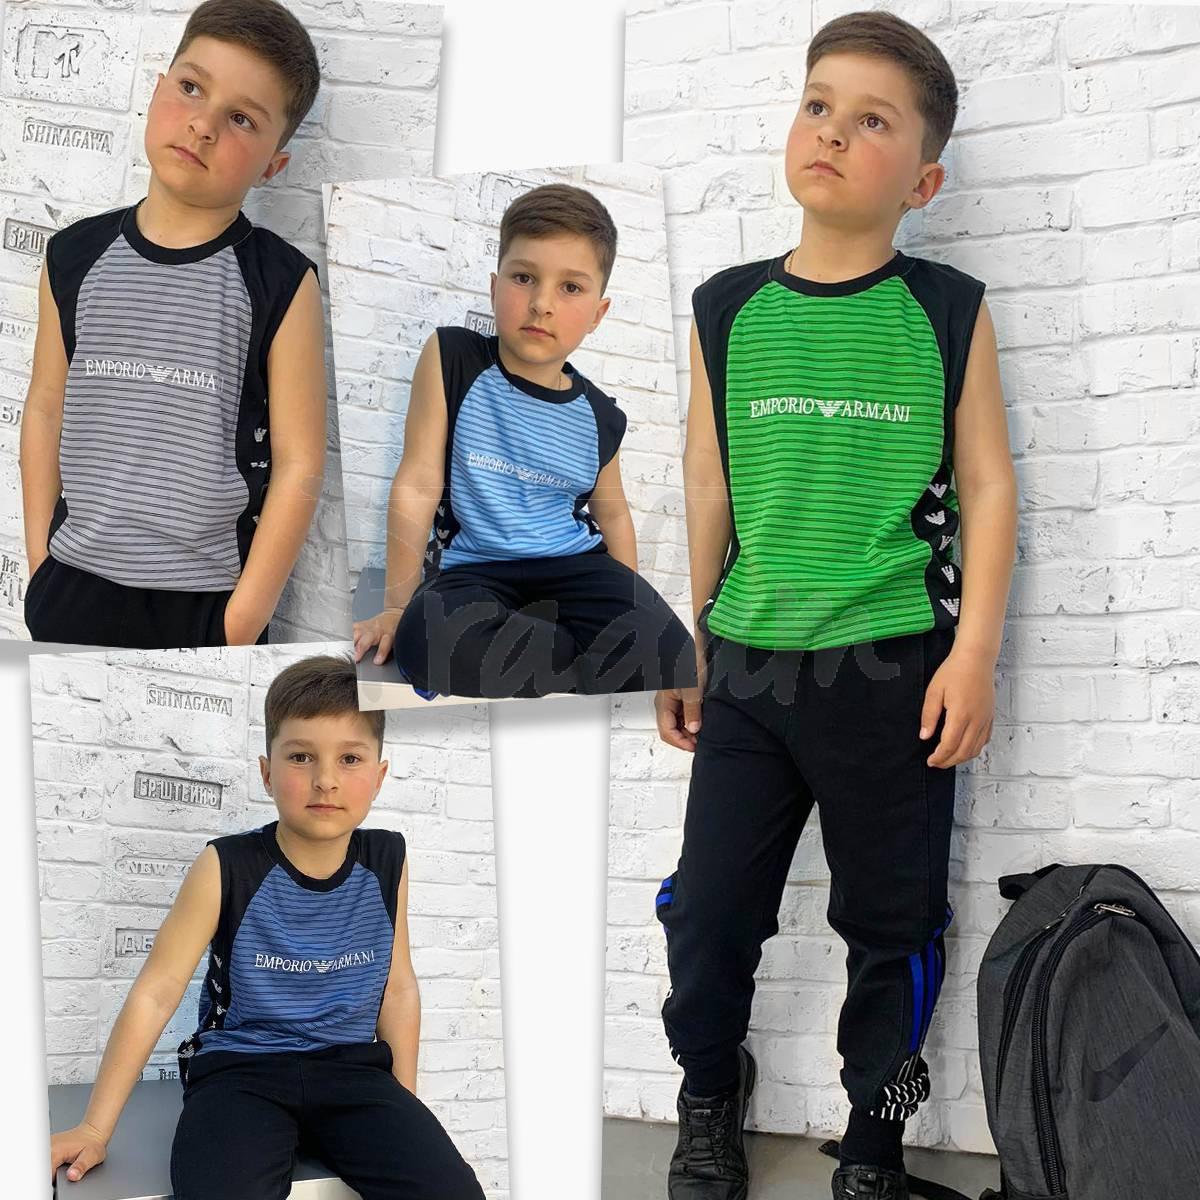 2087 футболка-безрукавка подростковая на мальчика 8-12 лет микс 5-ти цветов (10 ед. размеры: S/3.M/3.L/4)